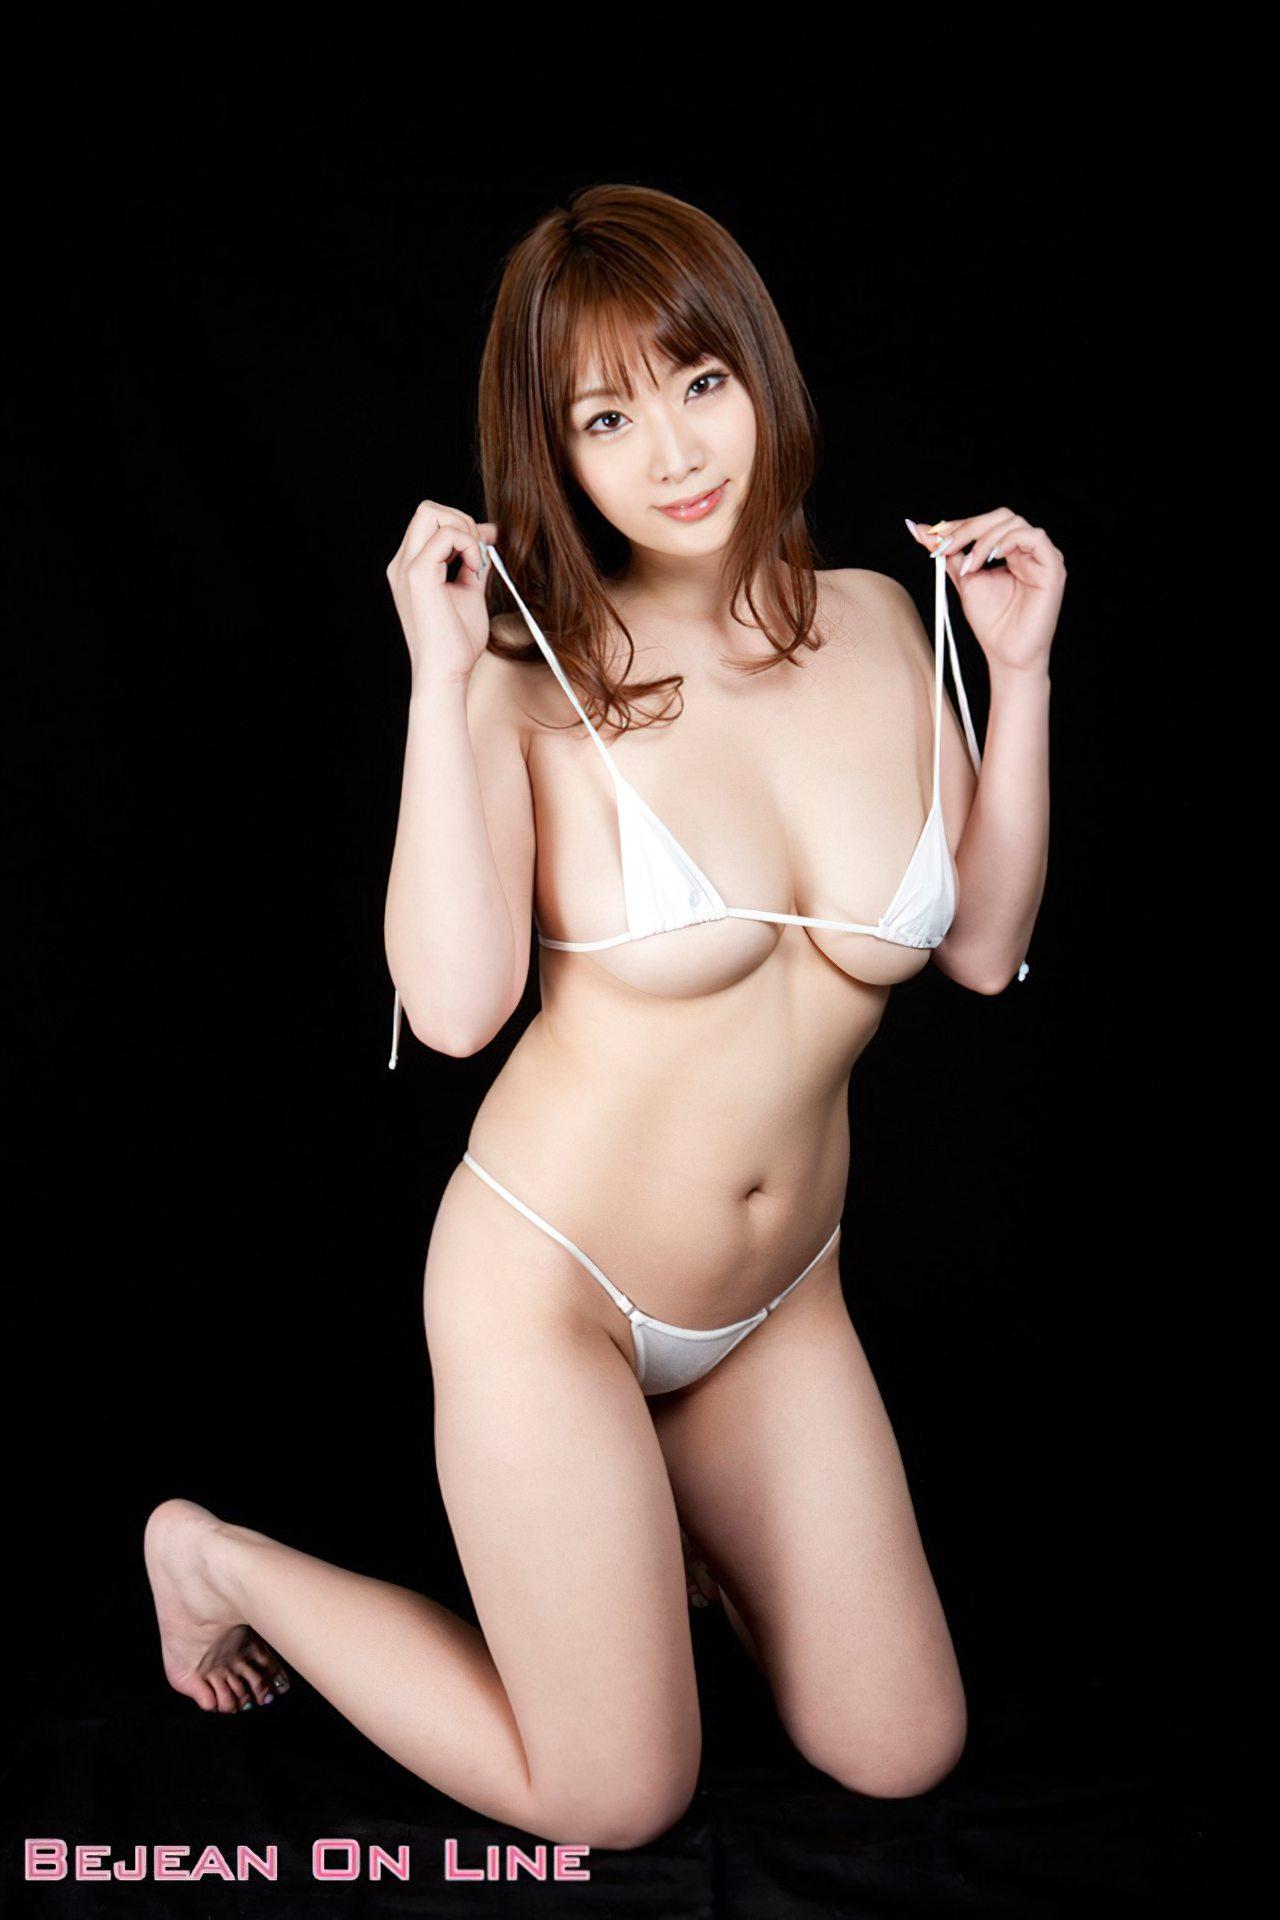 Japonesa Safada (24)